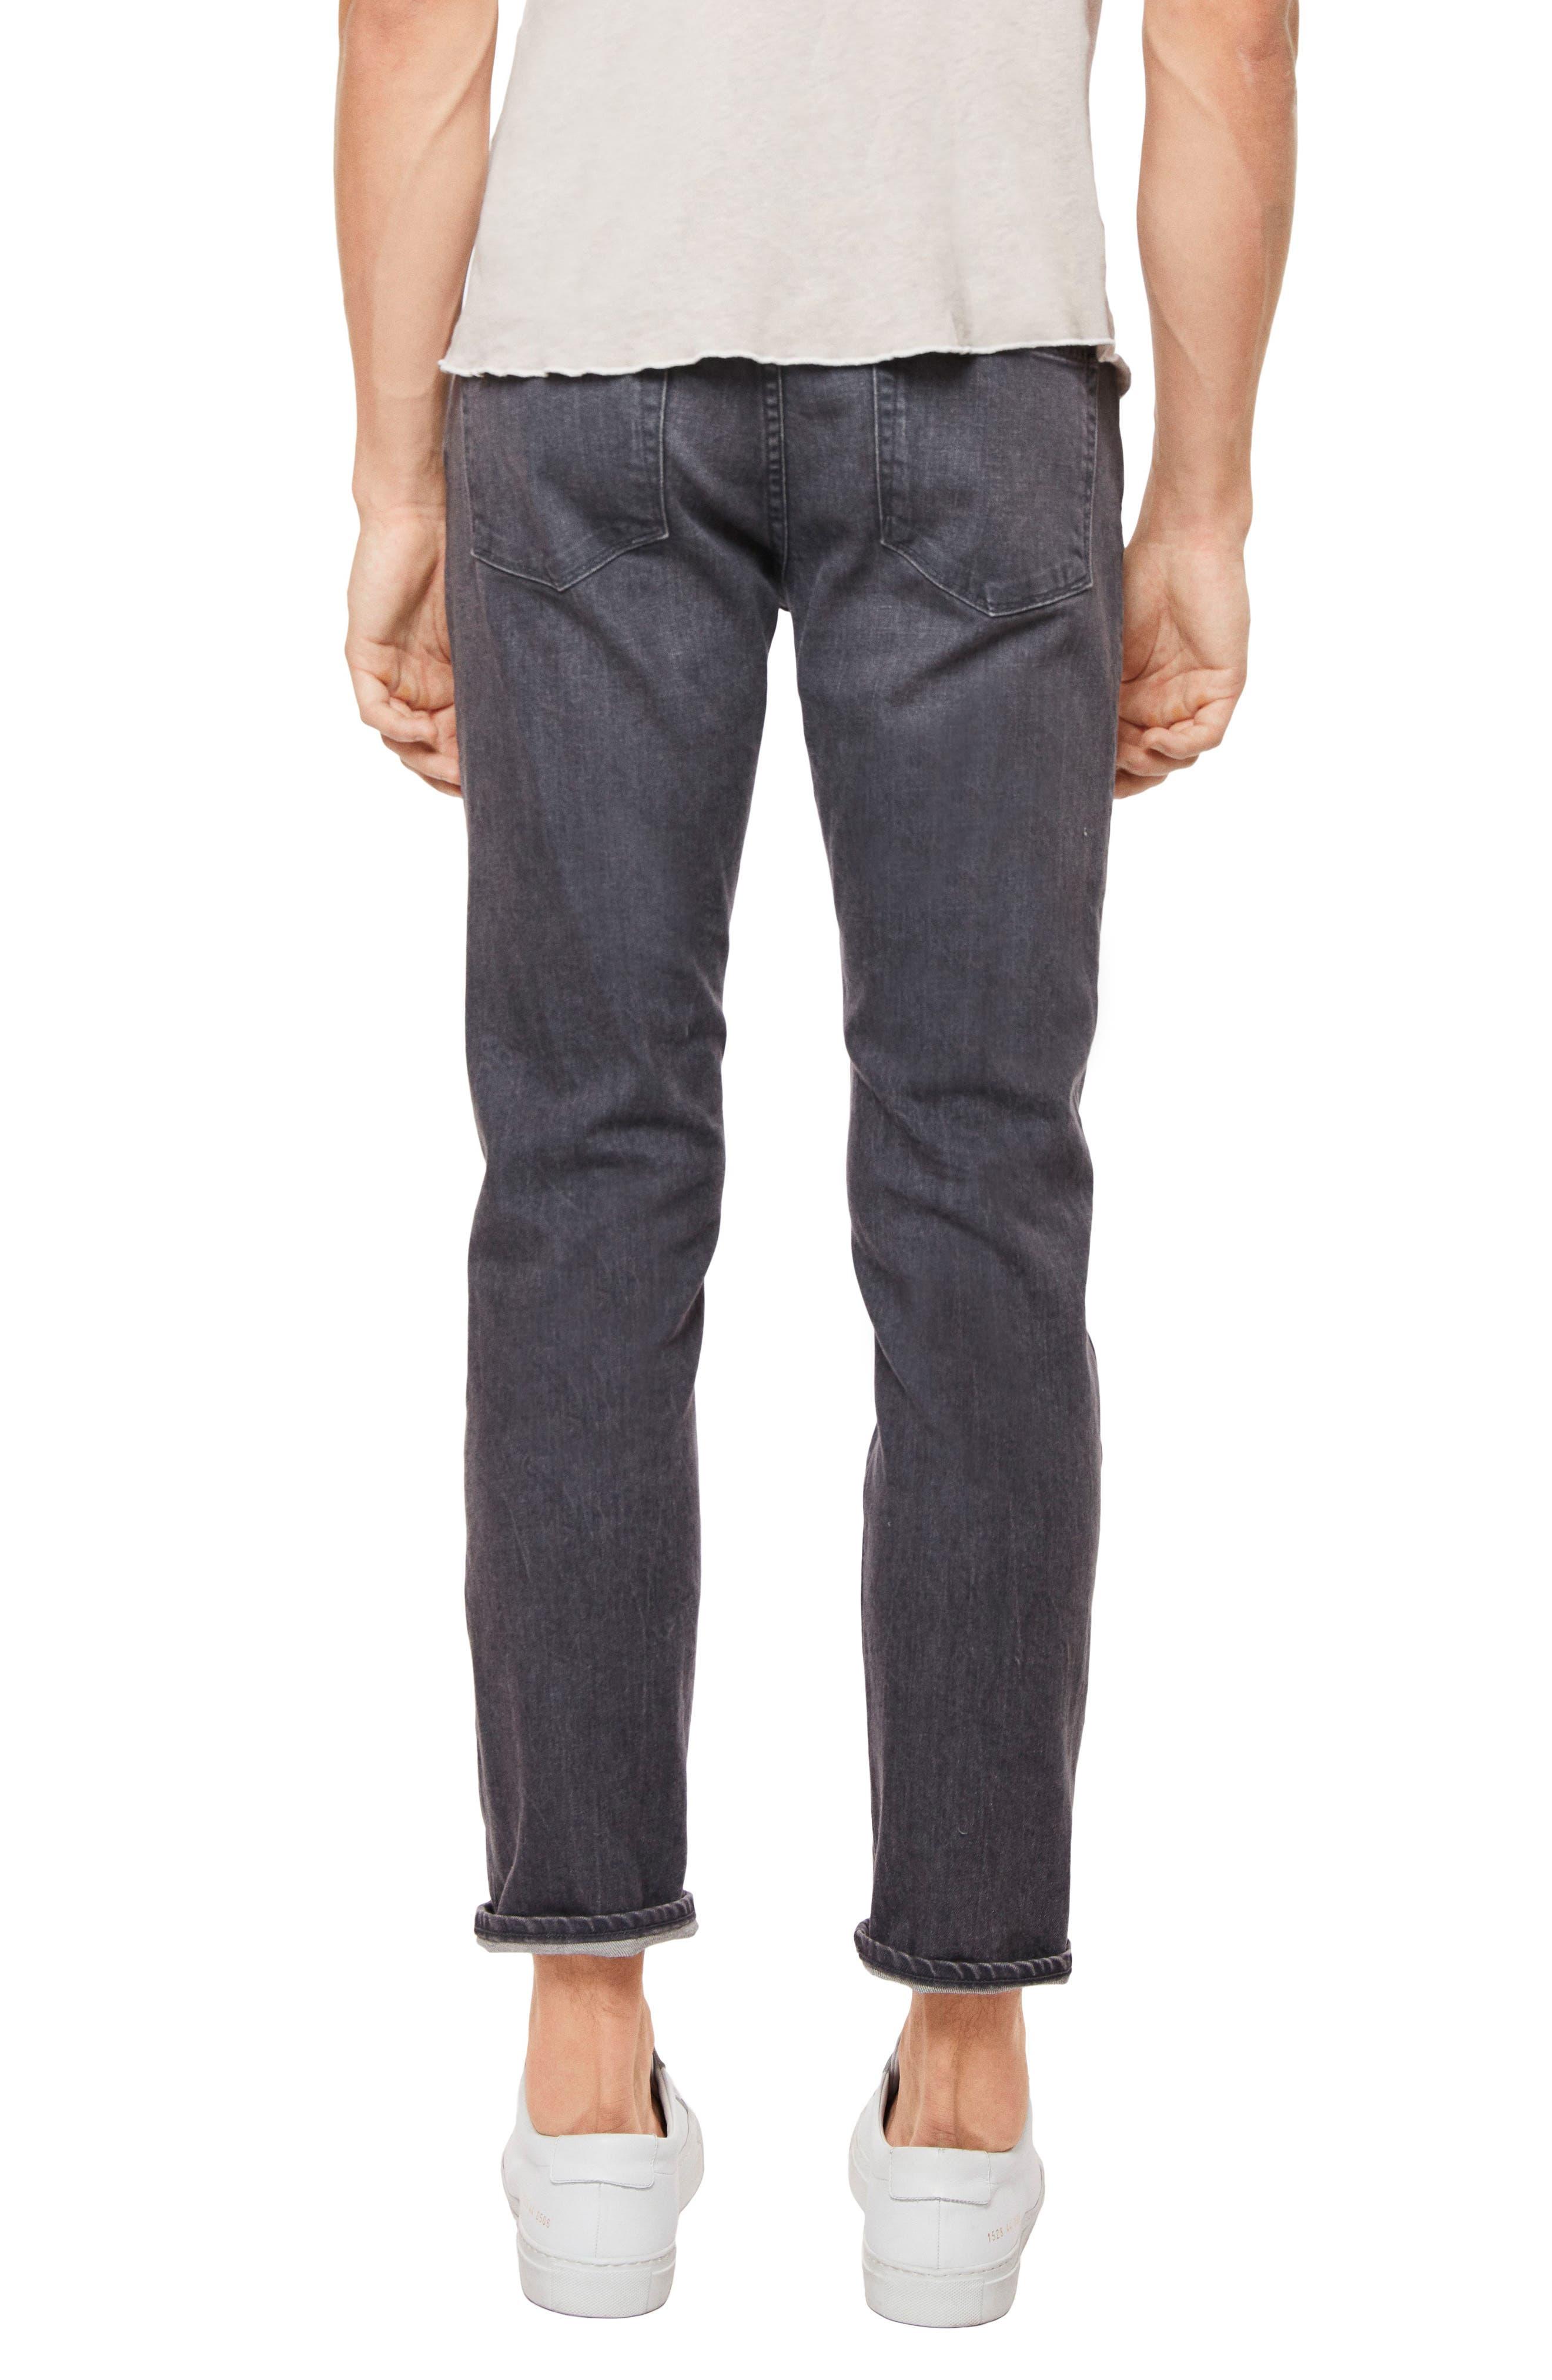 Eli Slim Fit Jeans,                             Alternate thumbnail 2, color,                             Topography